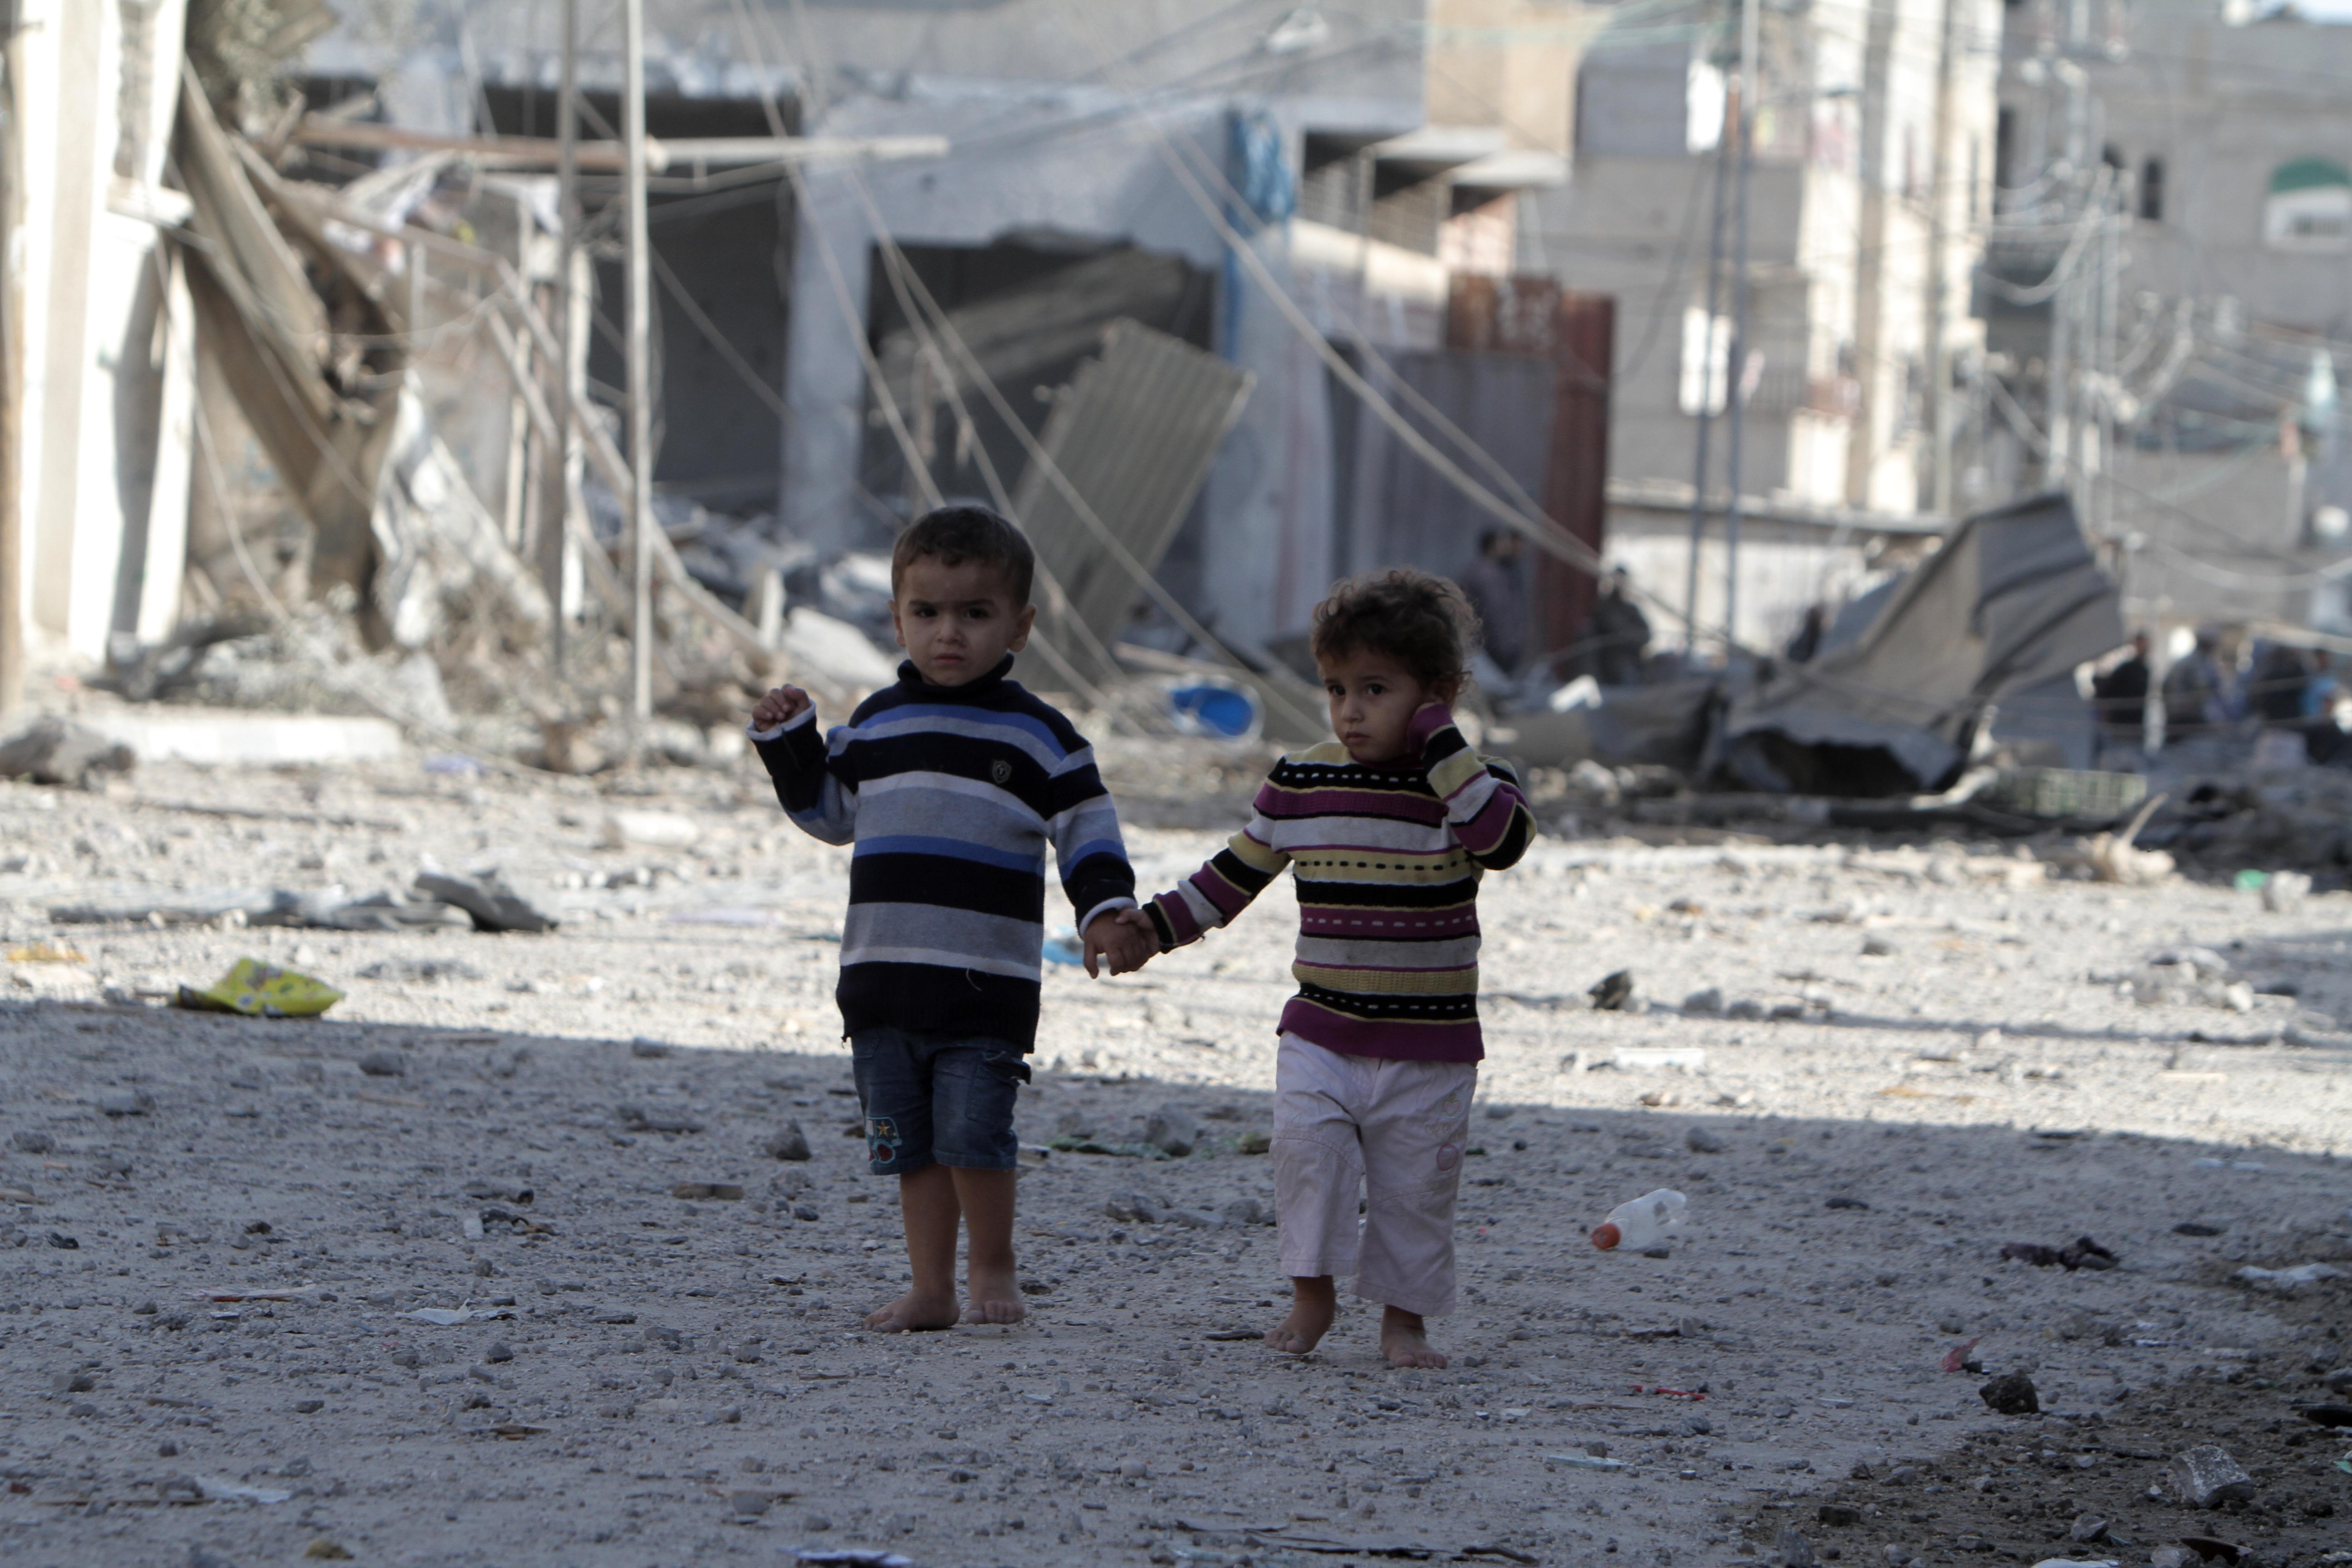 Israel-Gaza Konflikt: Kritik an Israel ist kein Antisemitismus